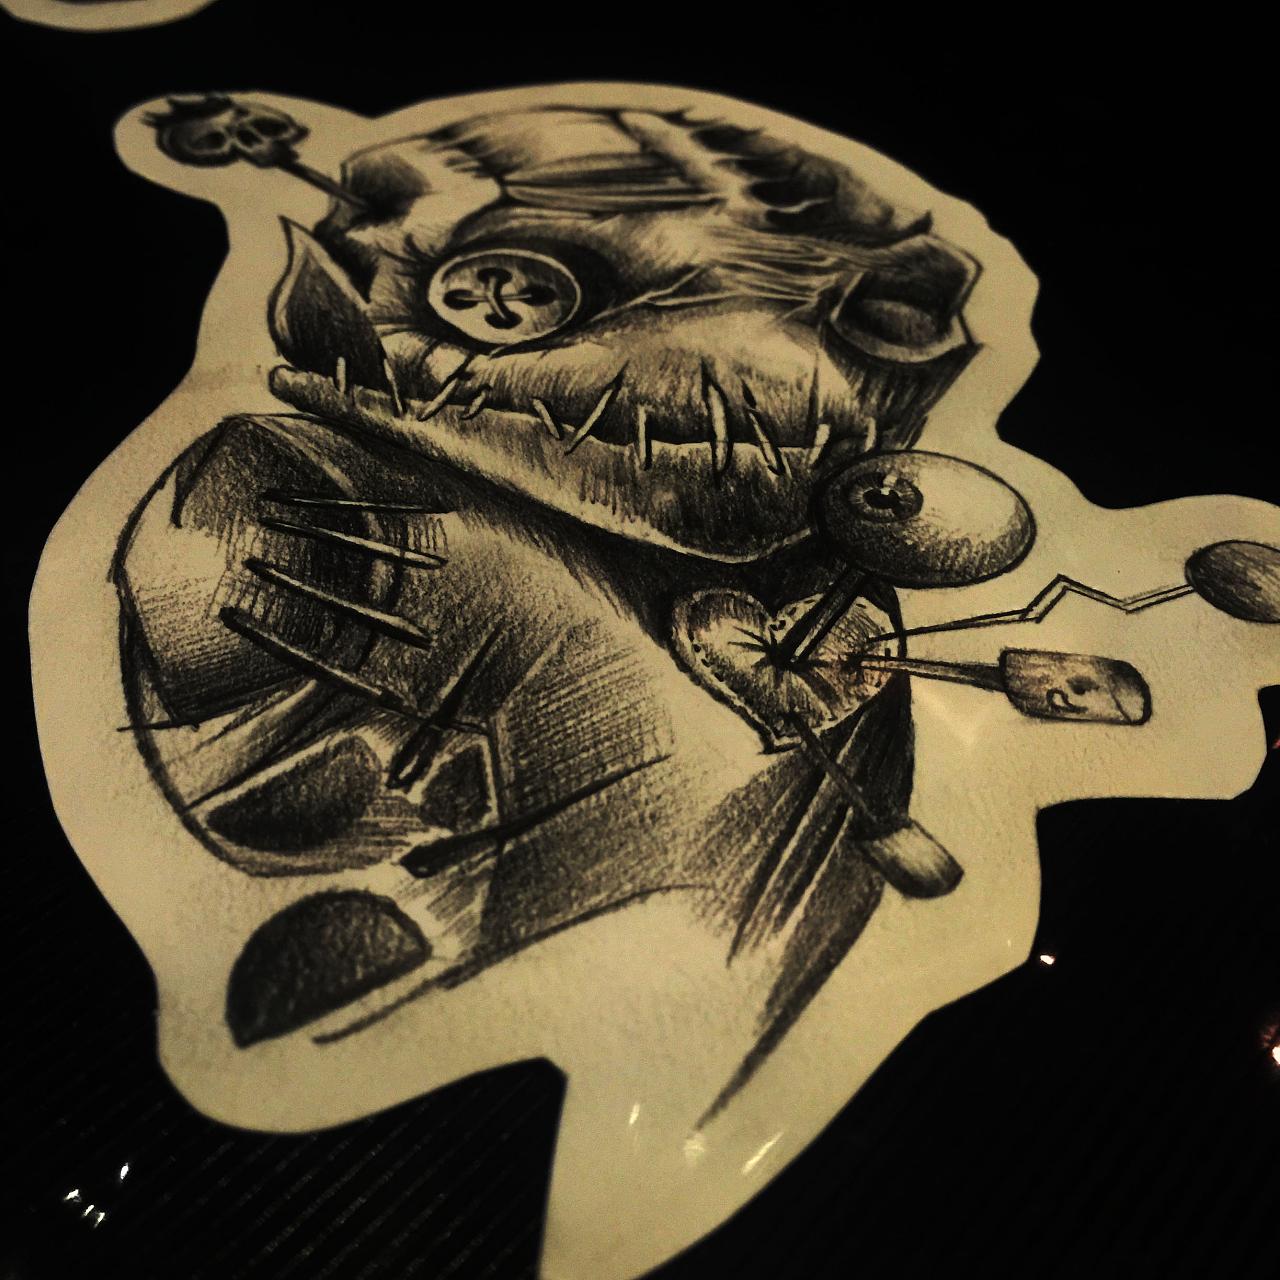 blackbee 黑蜂纹身设计 - 原创暗黑蒸汽乌鸦纹身手稿图片